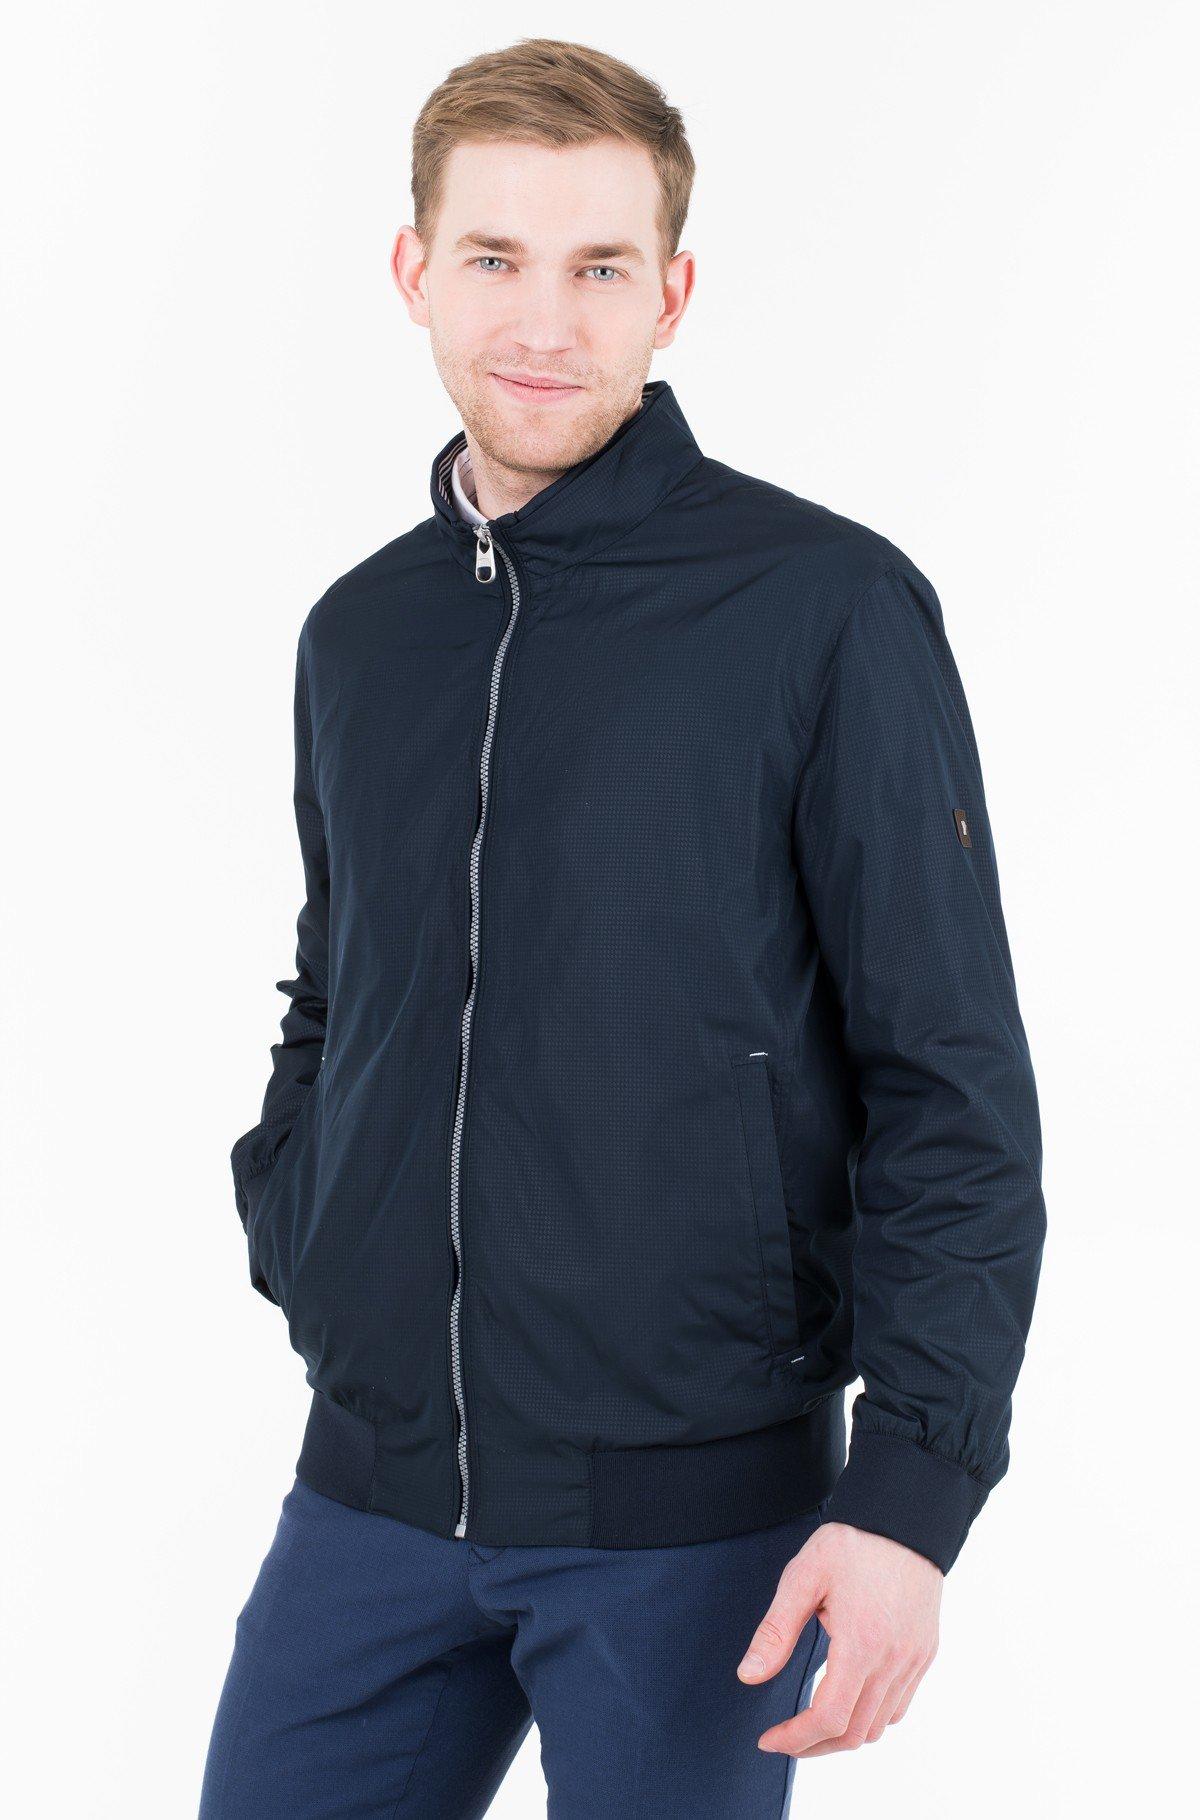 Jacket 4462-68050-full-1